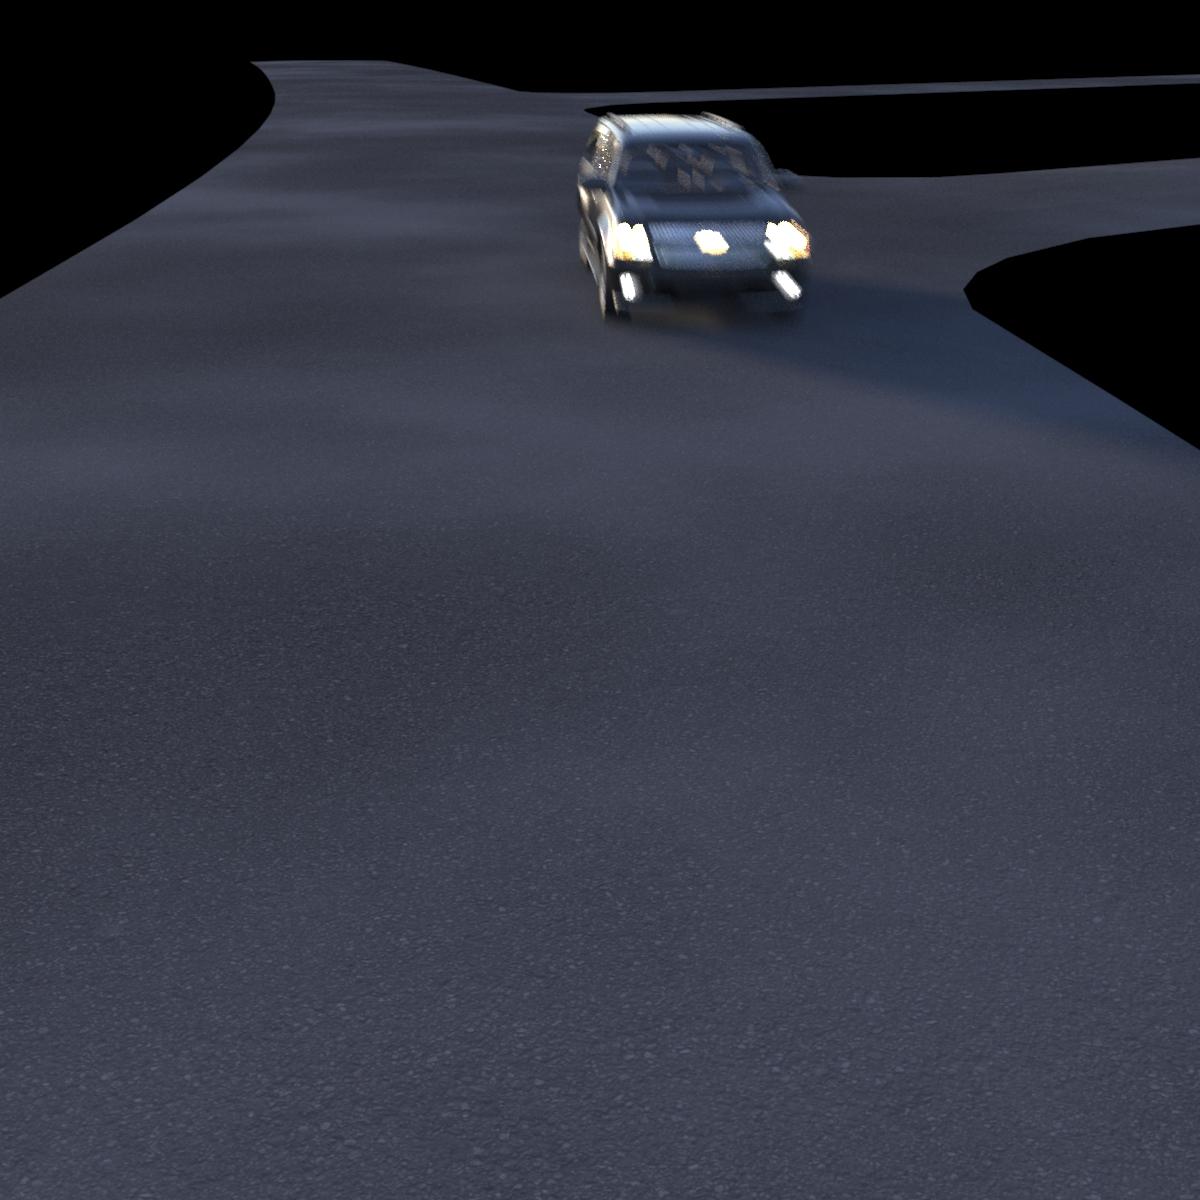 Road_DiffuseMixedNoise